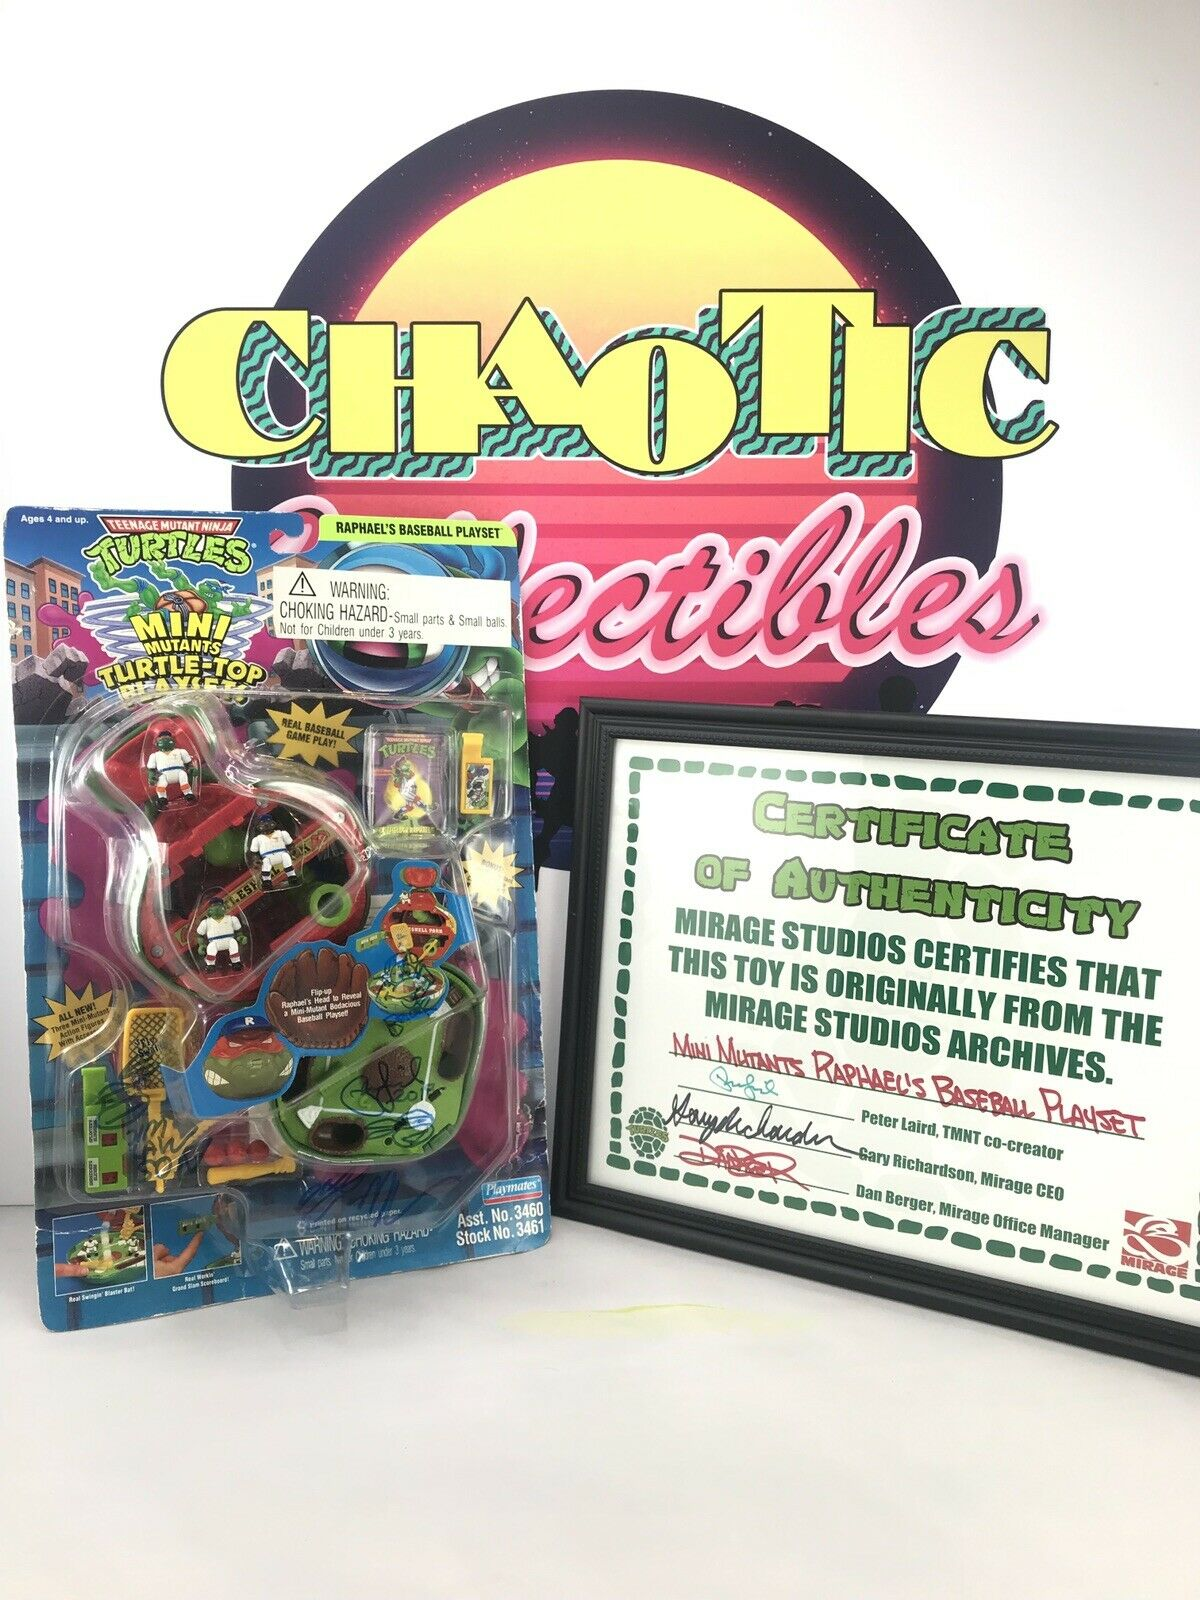 Teenage Mutant Ninja Turtles  década de 1990  Mini Micro Mutantes Raphael's béisbol Playset Tortuga Top  Firmado